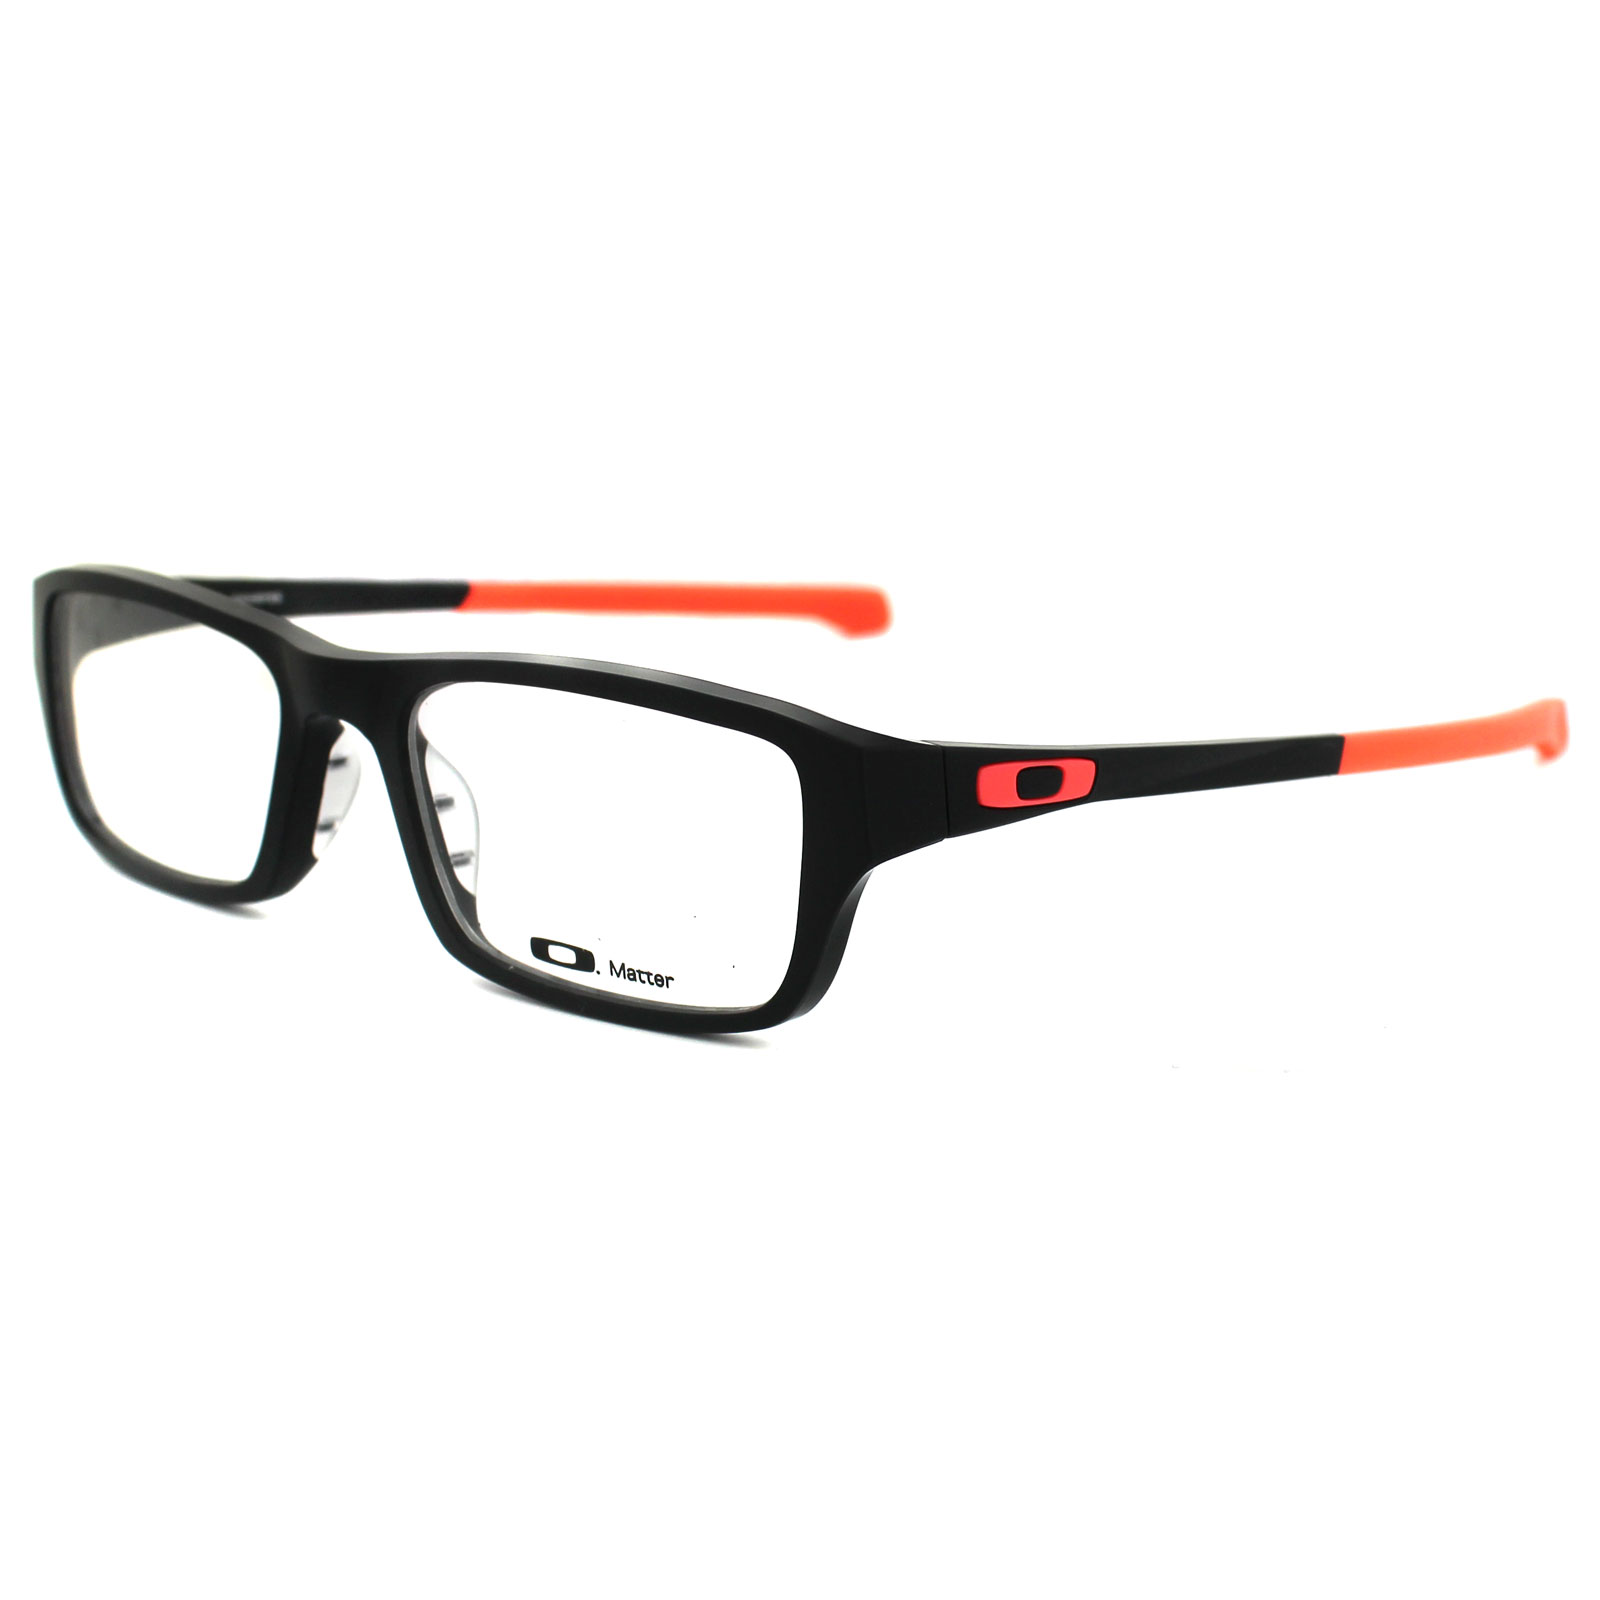 Oakley Glasses Frames Chamfer 8039 OX8039-07 Matt Black ...